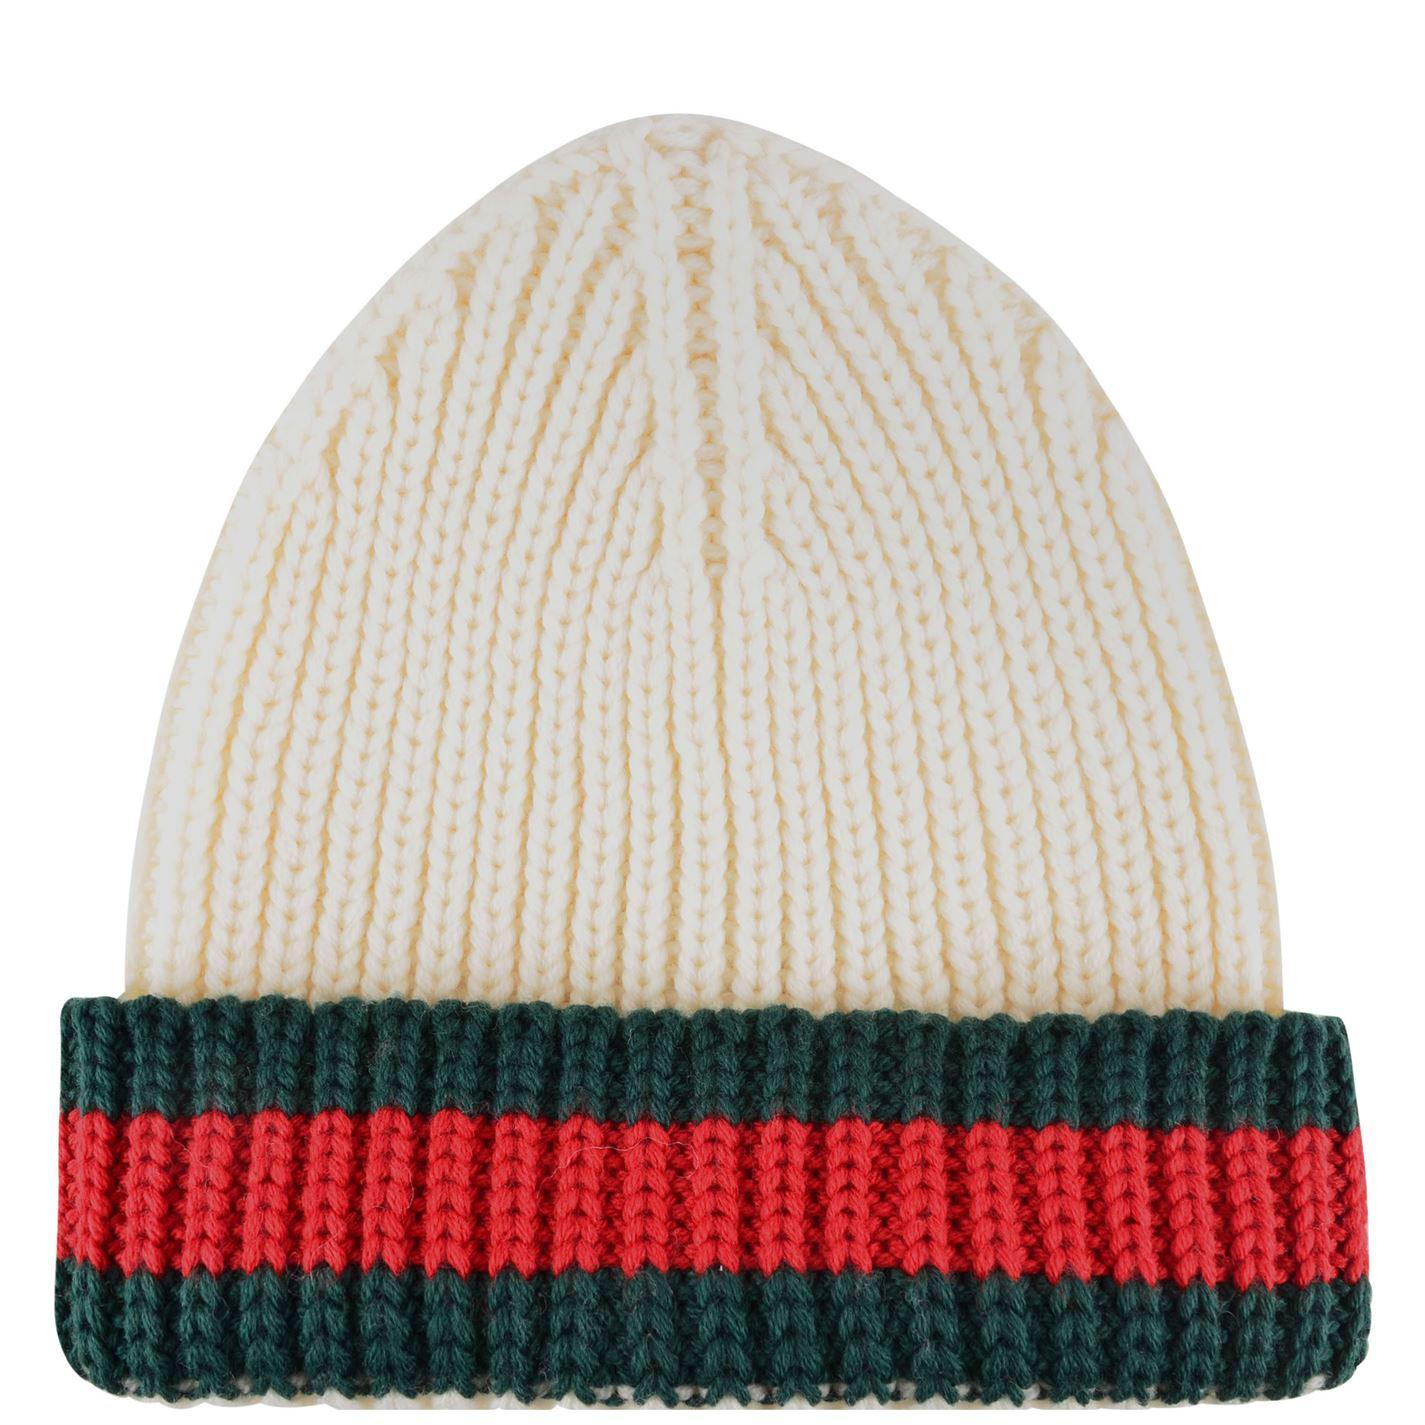 e1680b46cc6 Lyst - Gucci Web Trim Beanie Hat in White for Men